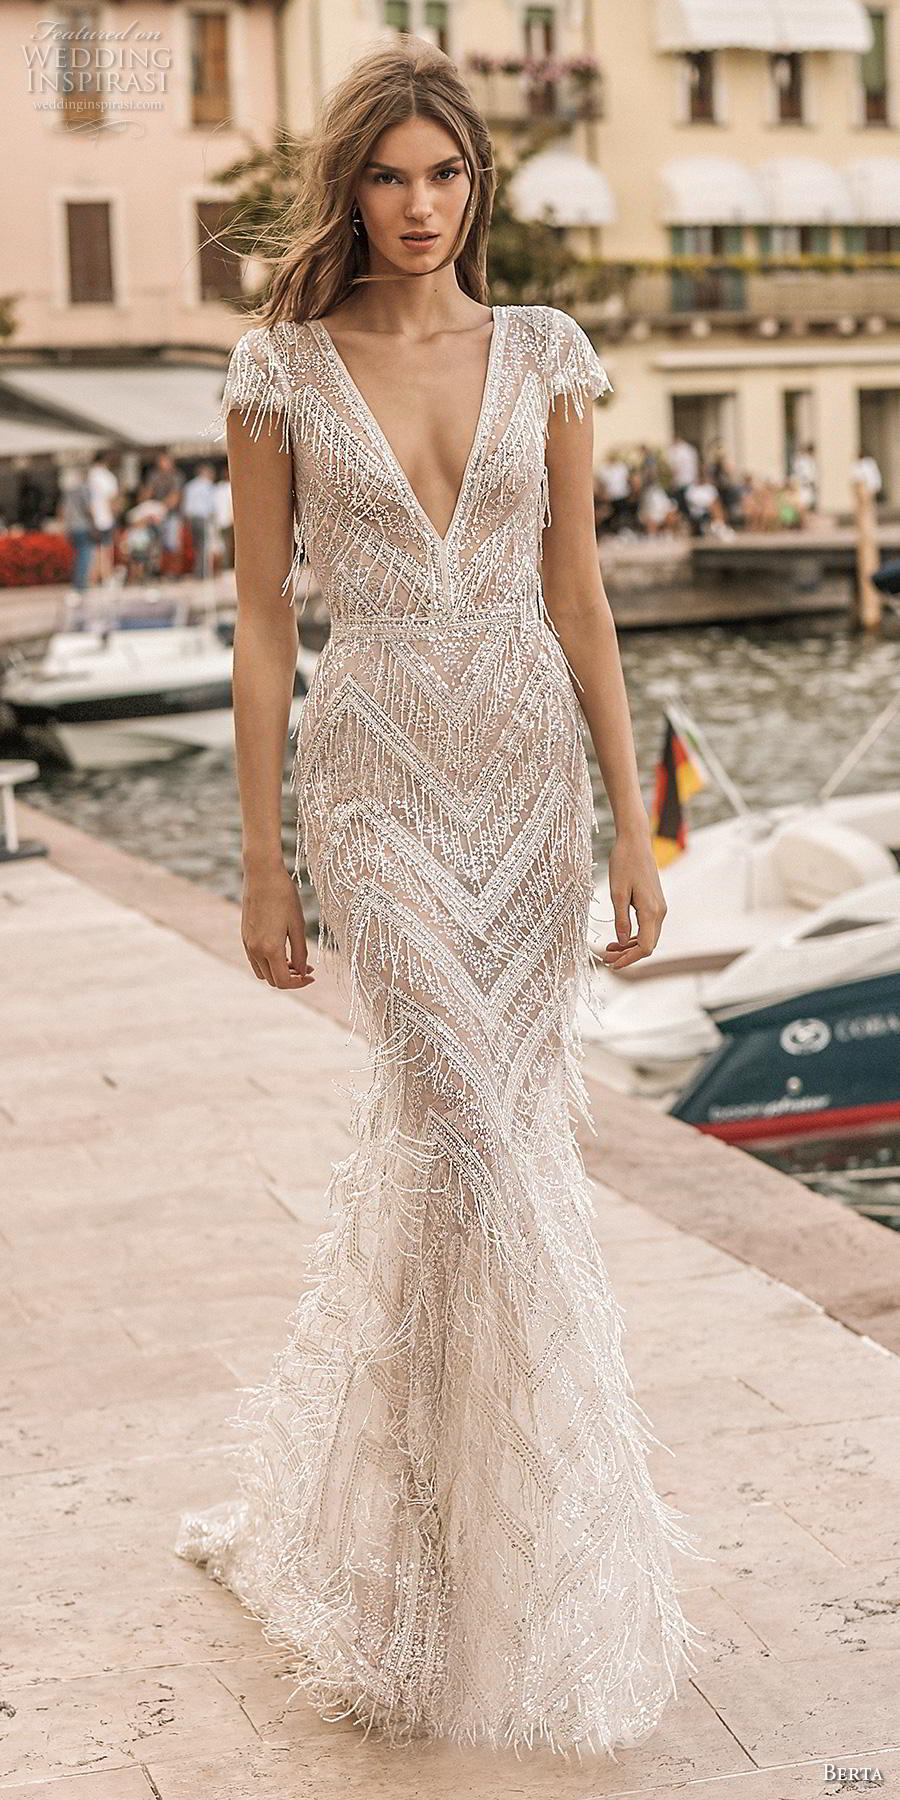 berta 2019 privee bridal cap sleeves deep v neck full embellishment glitzy elegant fit and flare wedding dress backless v back medium train (10) lv